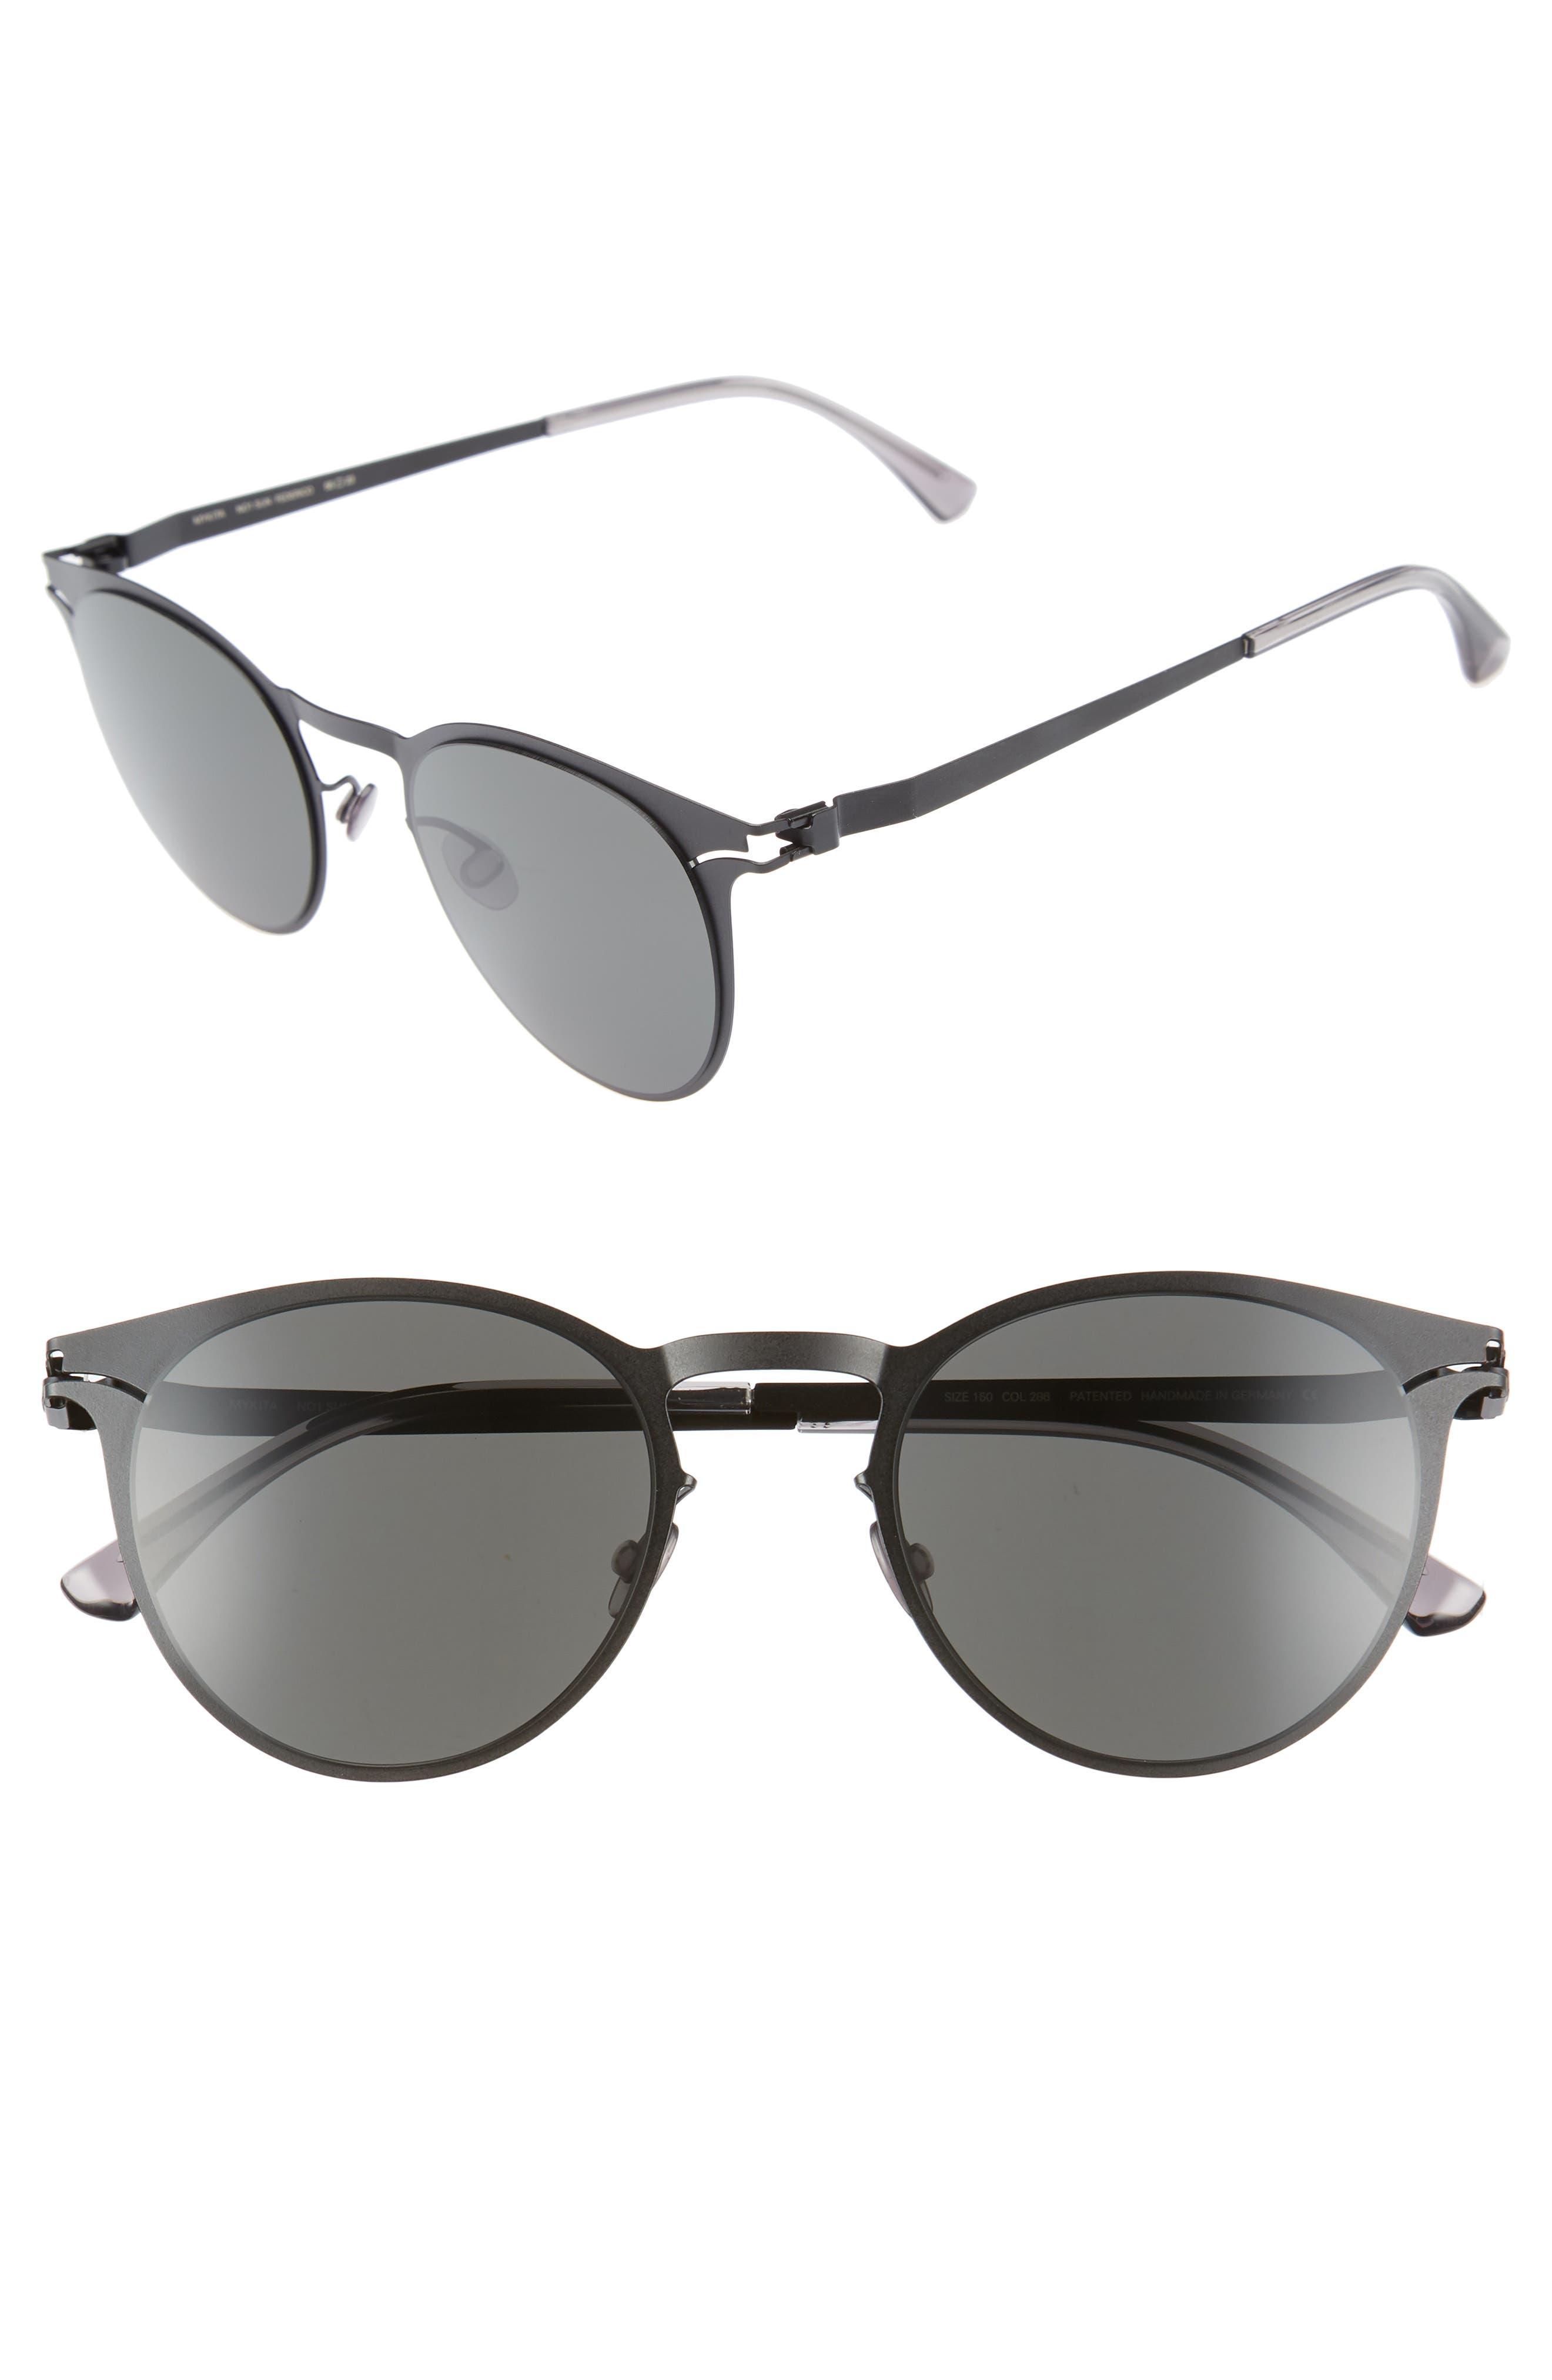 Federico 55mm Sunglasses,                             Main thumbnail 1, color,                             Matte Black